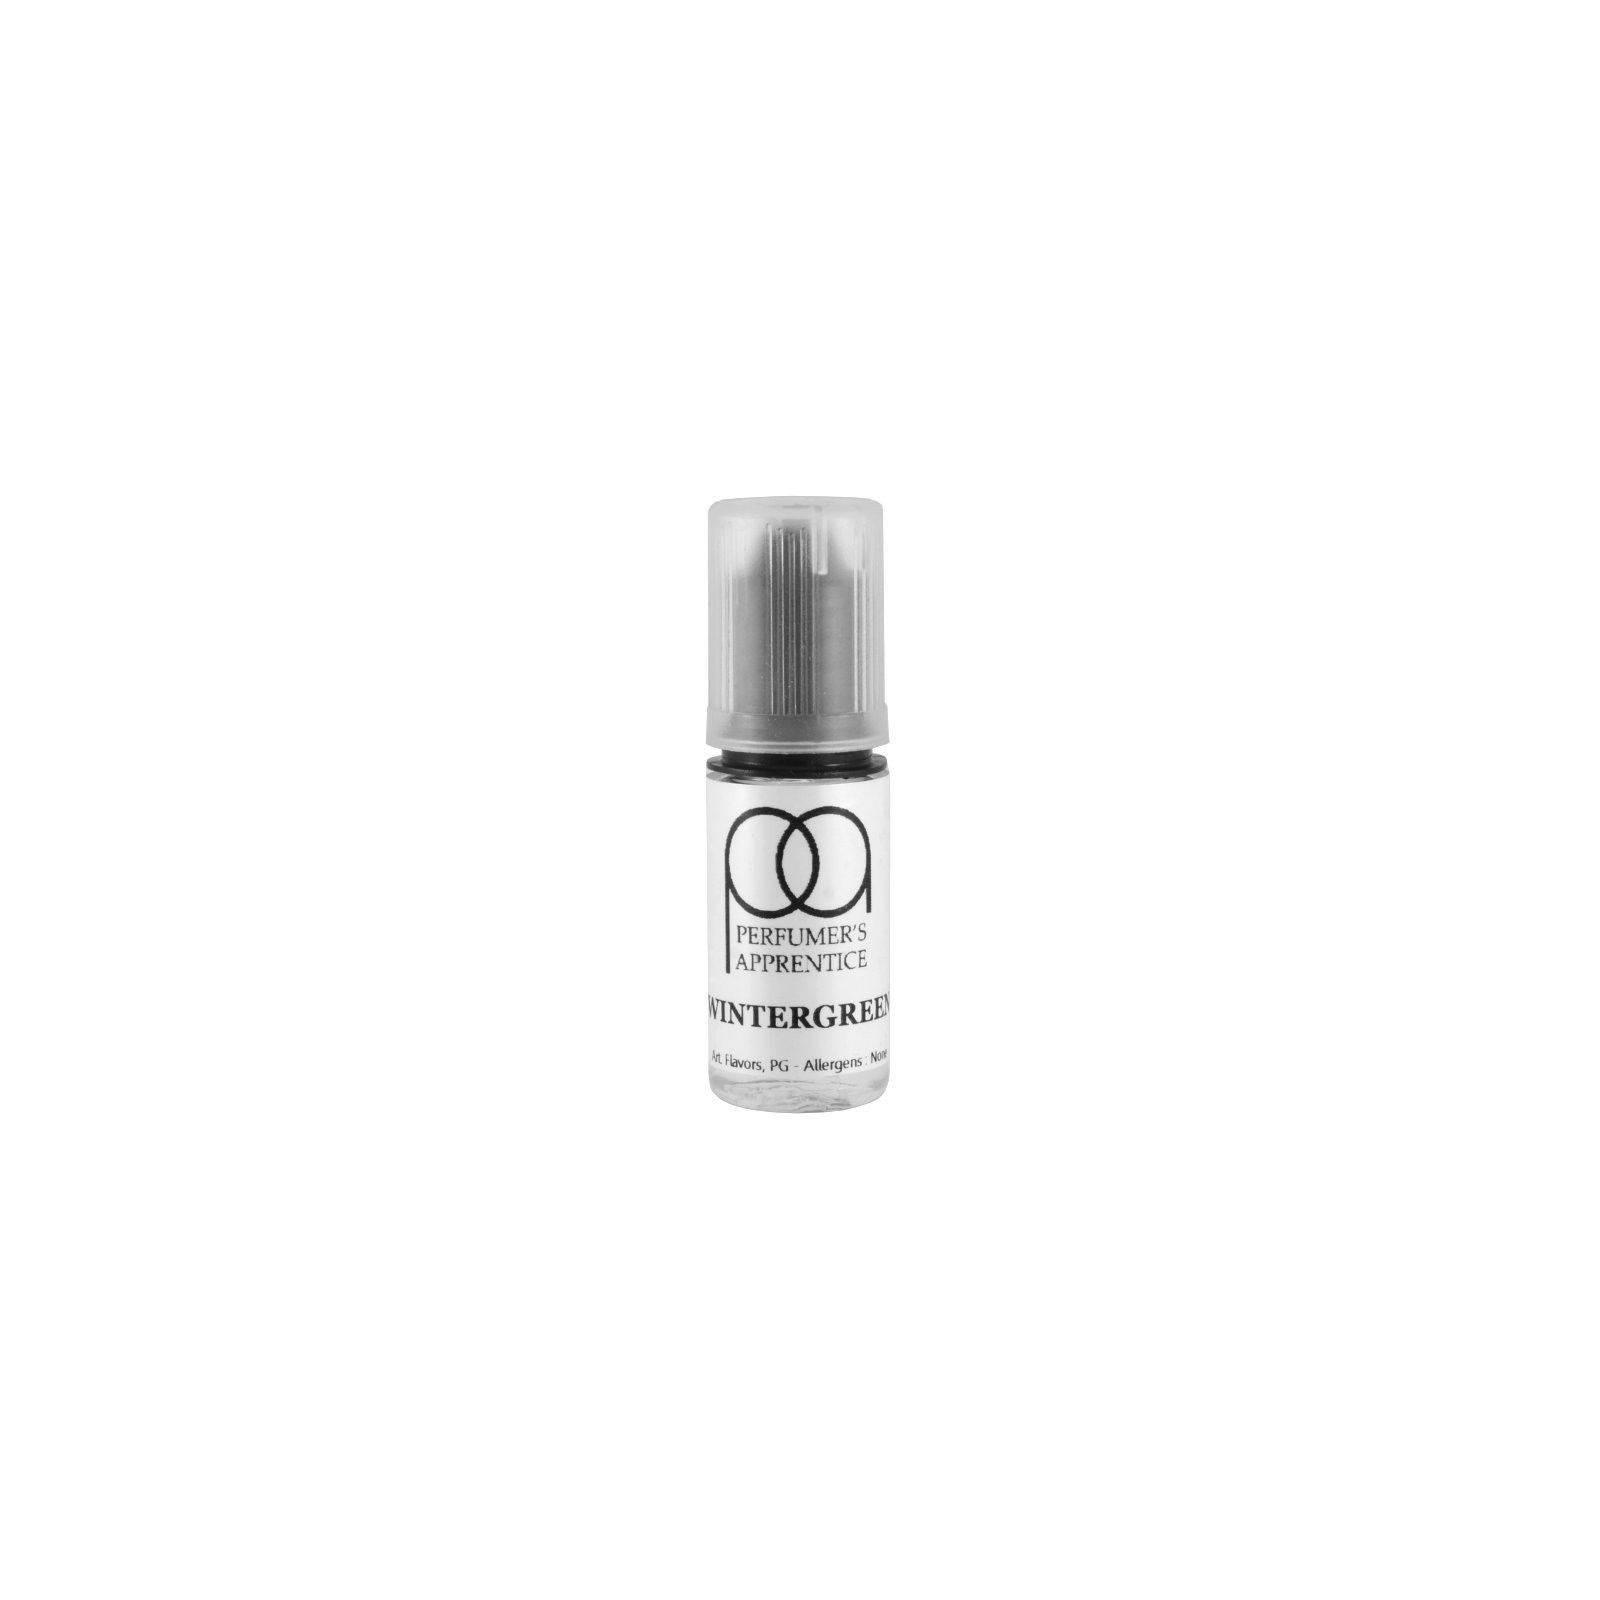 Concentré Wintergreen - Perfumer's Apprentice